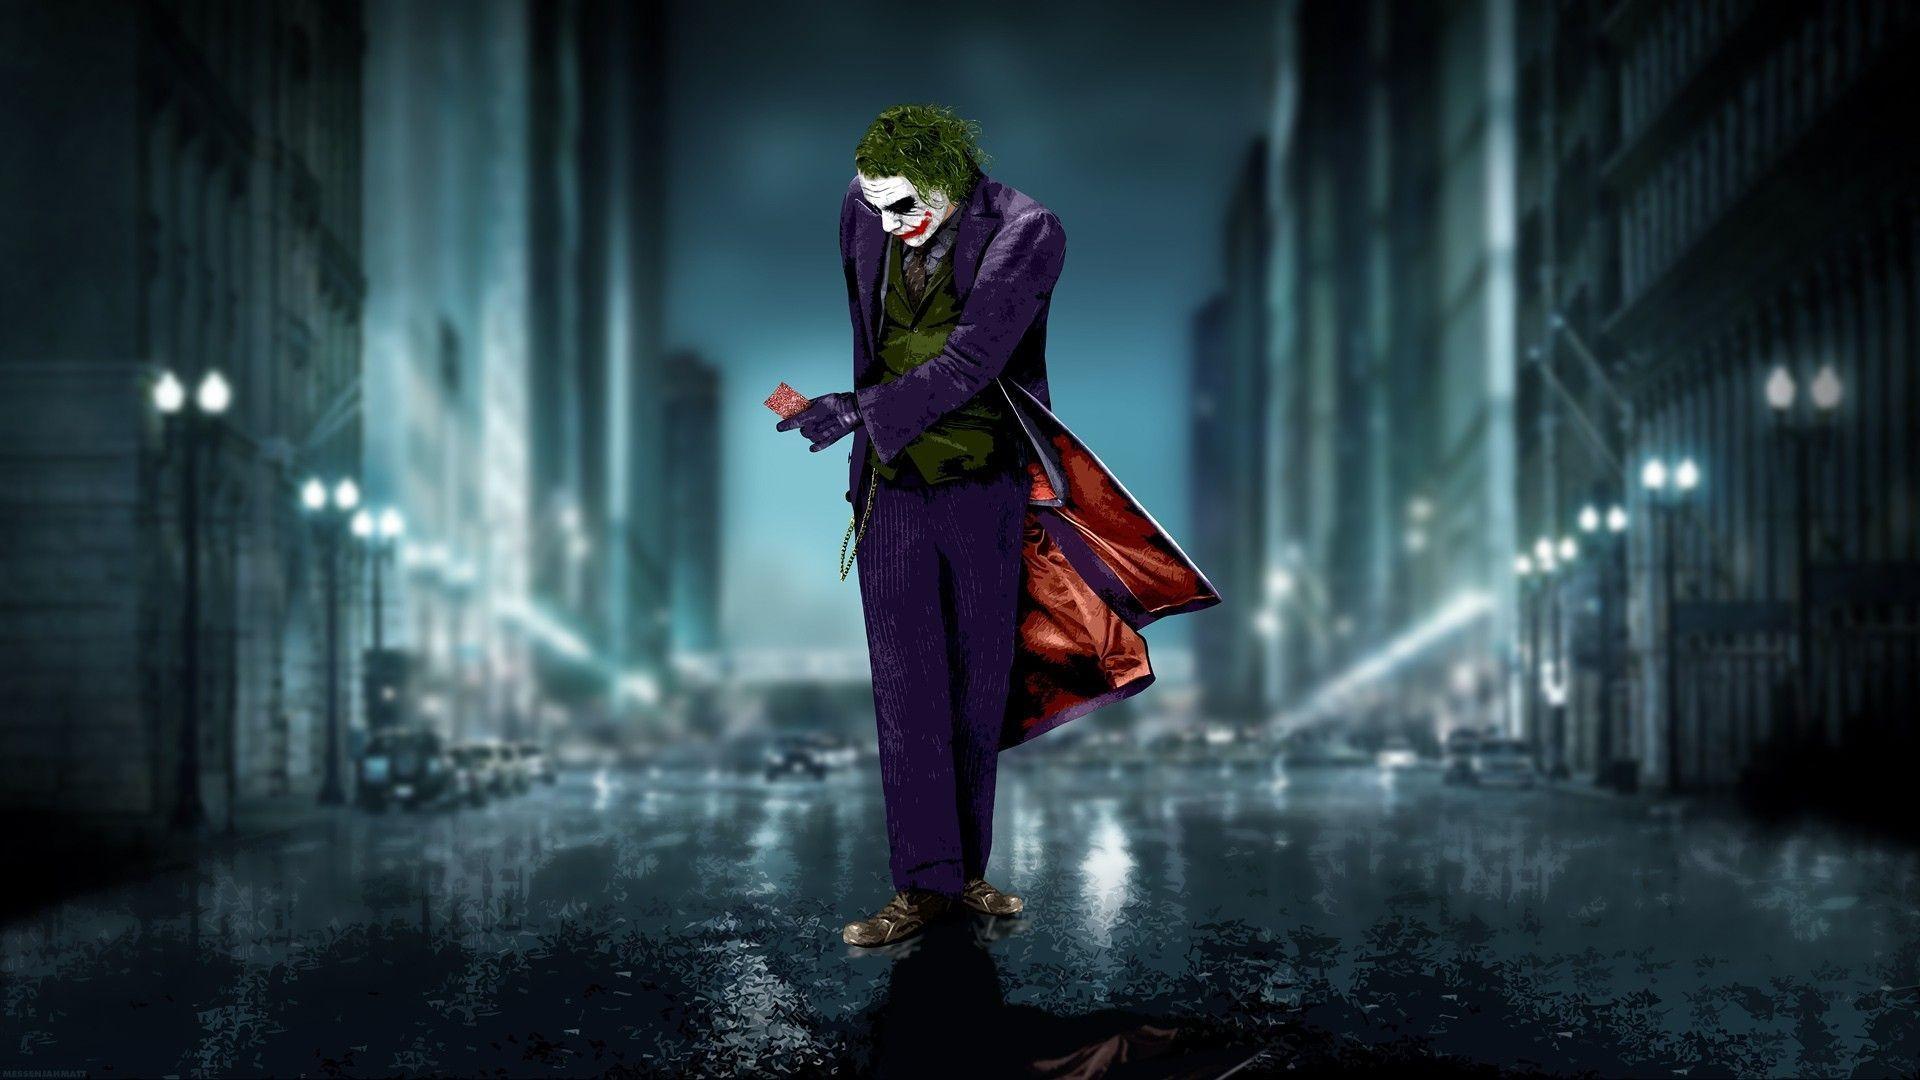 Joker HD Wallpapers Backgrounds Wallpaper